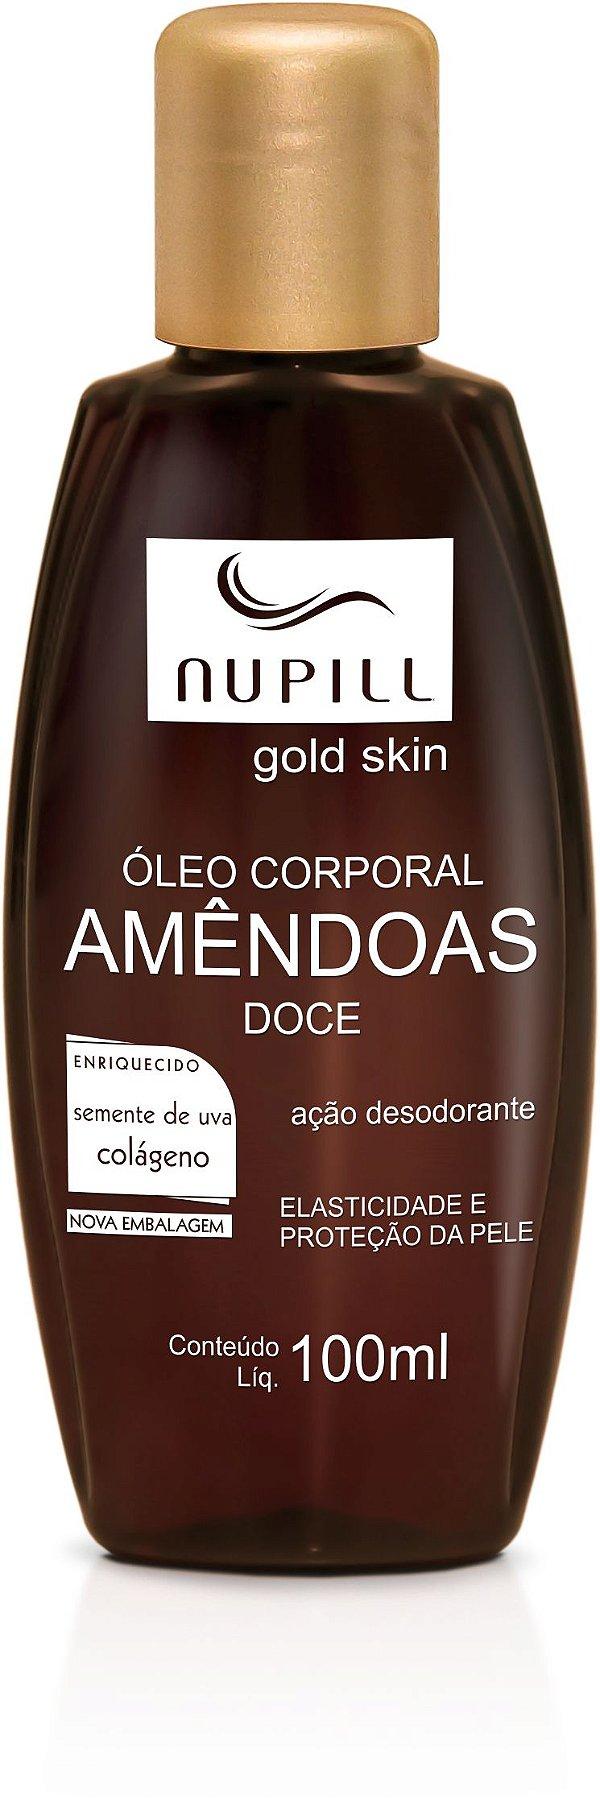 NUPILL ÓLEO CORPORAL AMÊNDOAS SEMENTE DE UVA / COLÁGENO 100ML